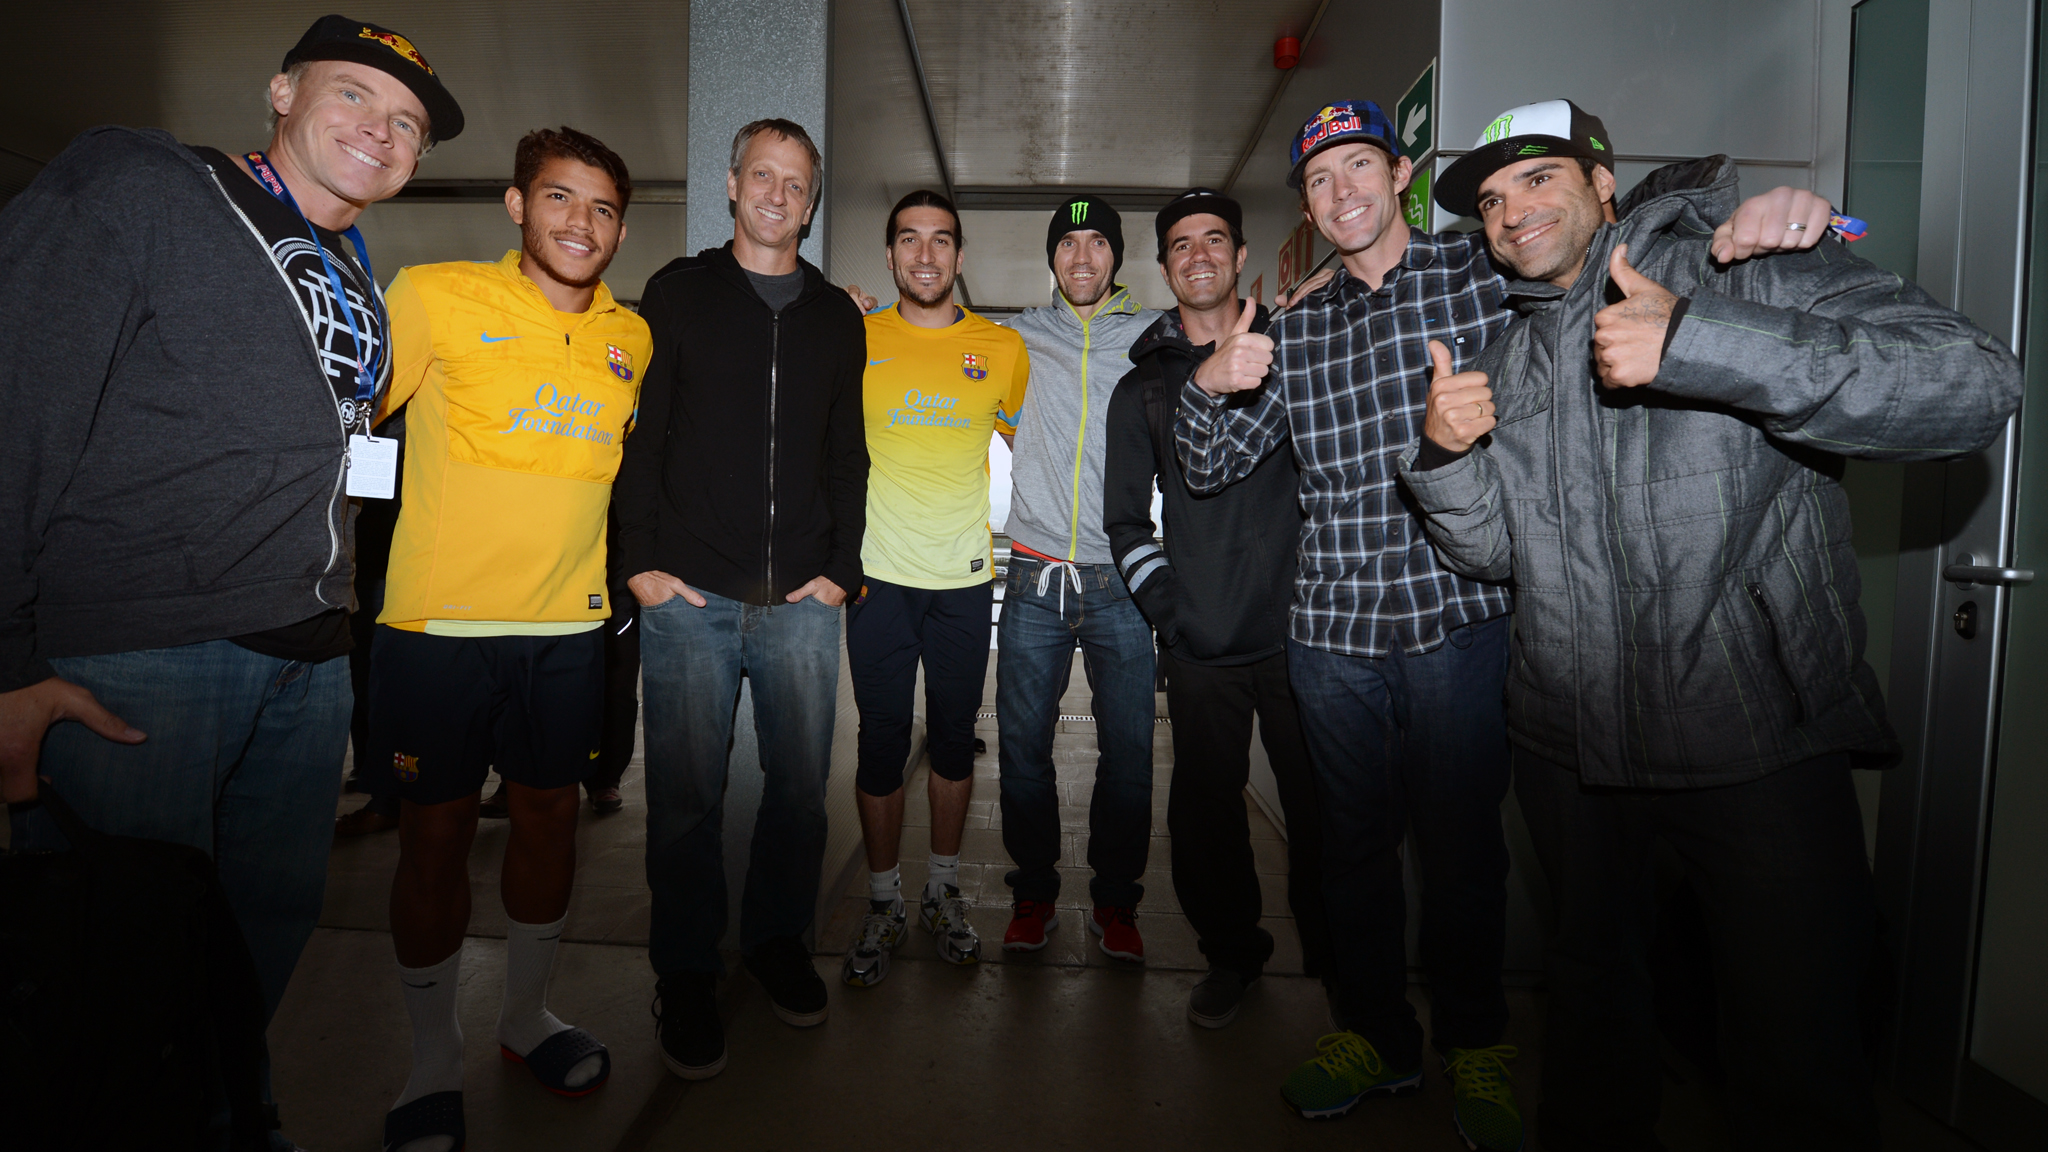 Kevin Robinson, Jonathan Dos Santos, Tony Hawk, Jose Pinto, Jamie Bestwick, Bob Burnquist, Travis Pastrana and Edgar Torronteras